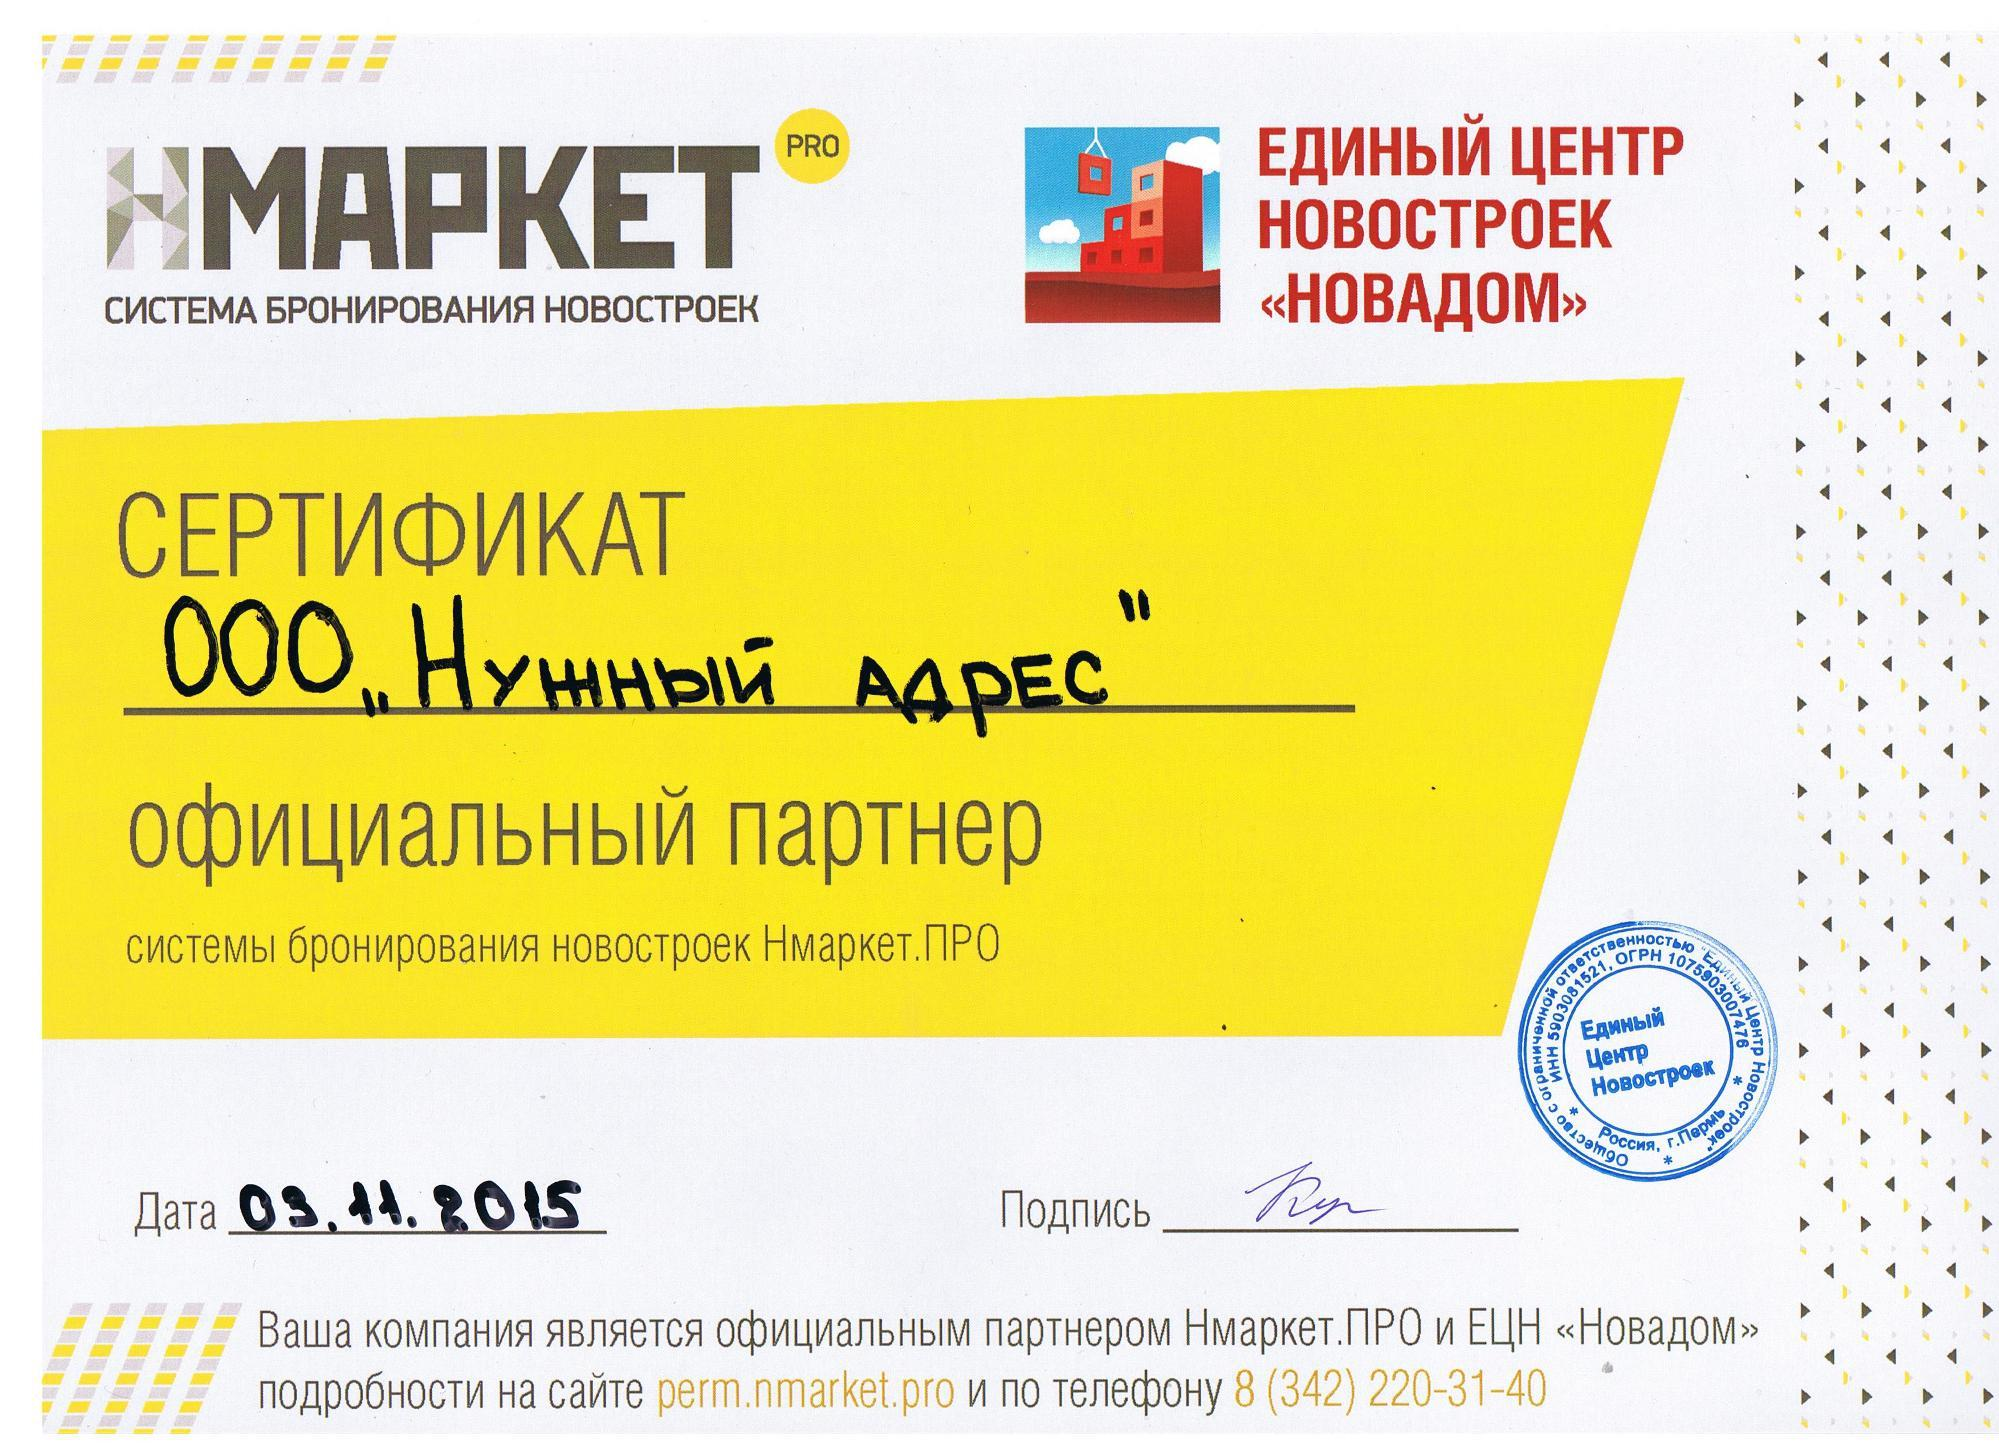 Сертификат Нмаркет.ПРО